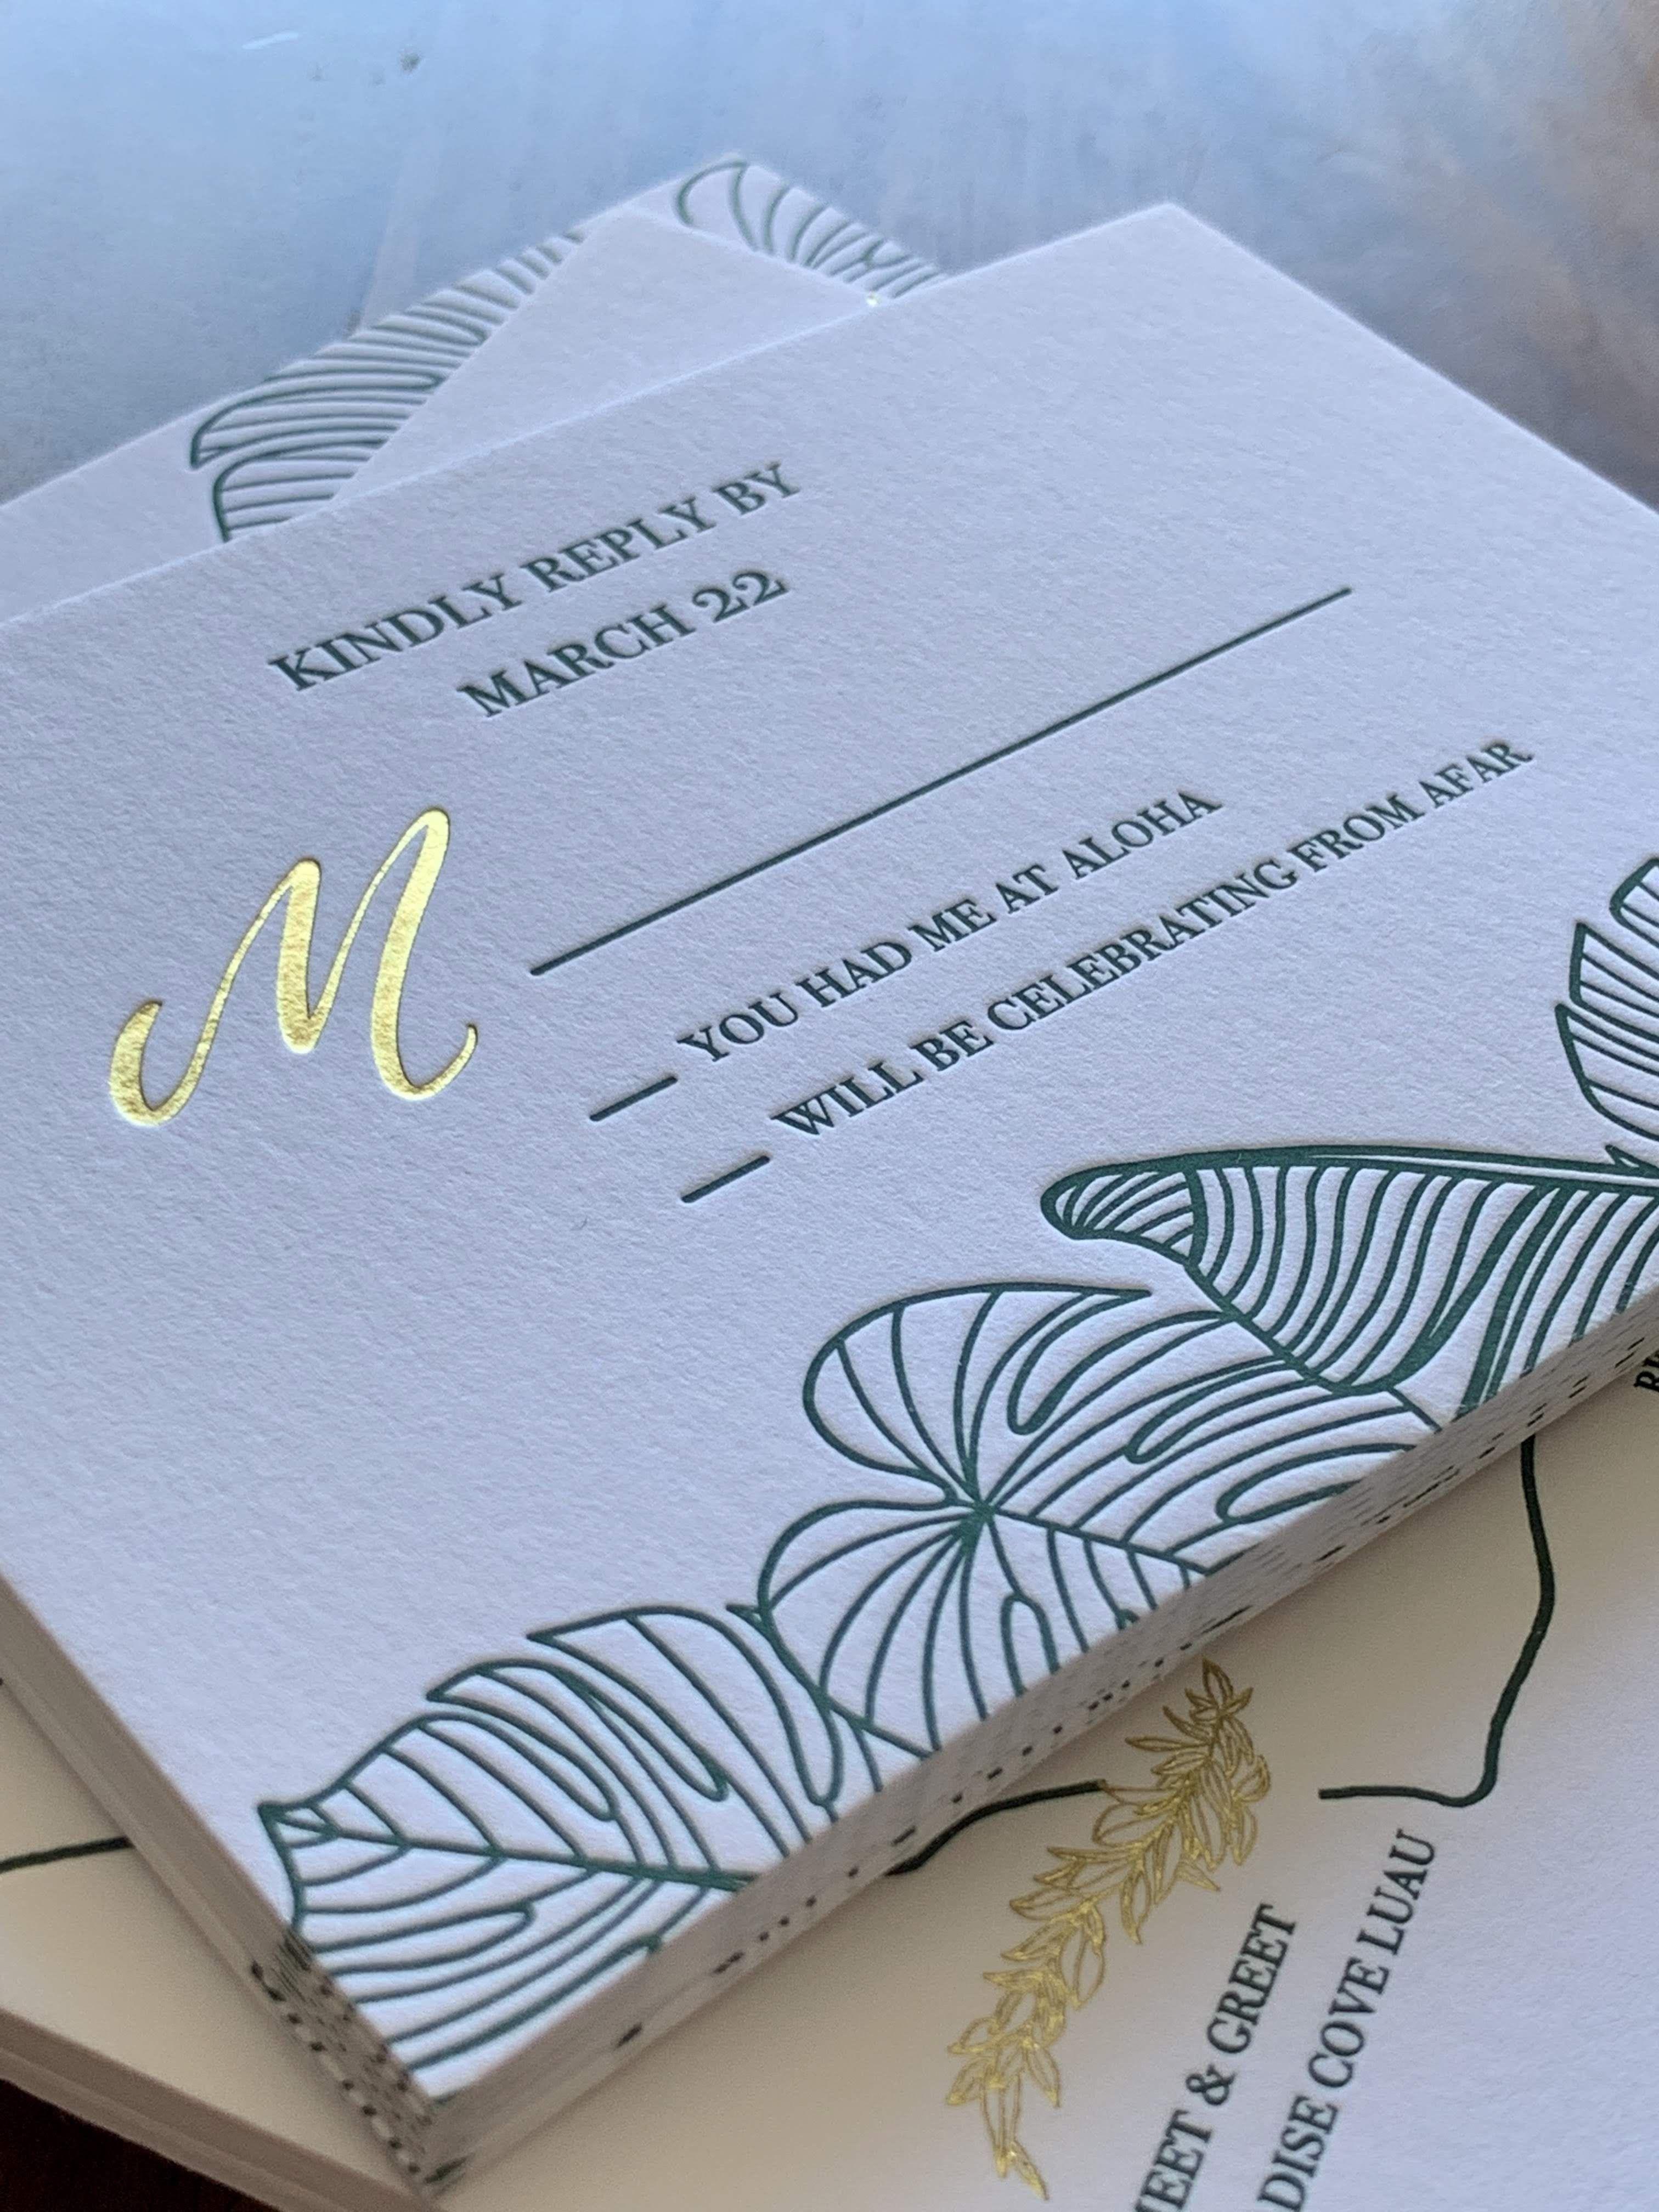 Intimate wedding in Hawaii  This wedding invitation set the